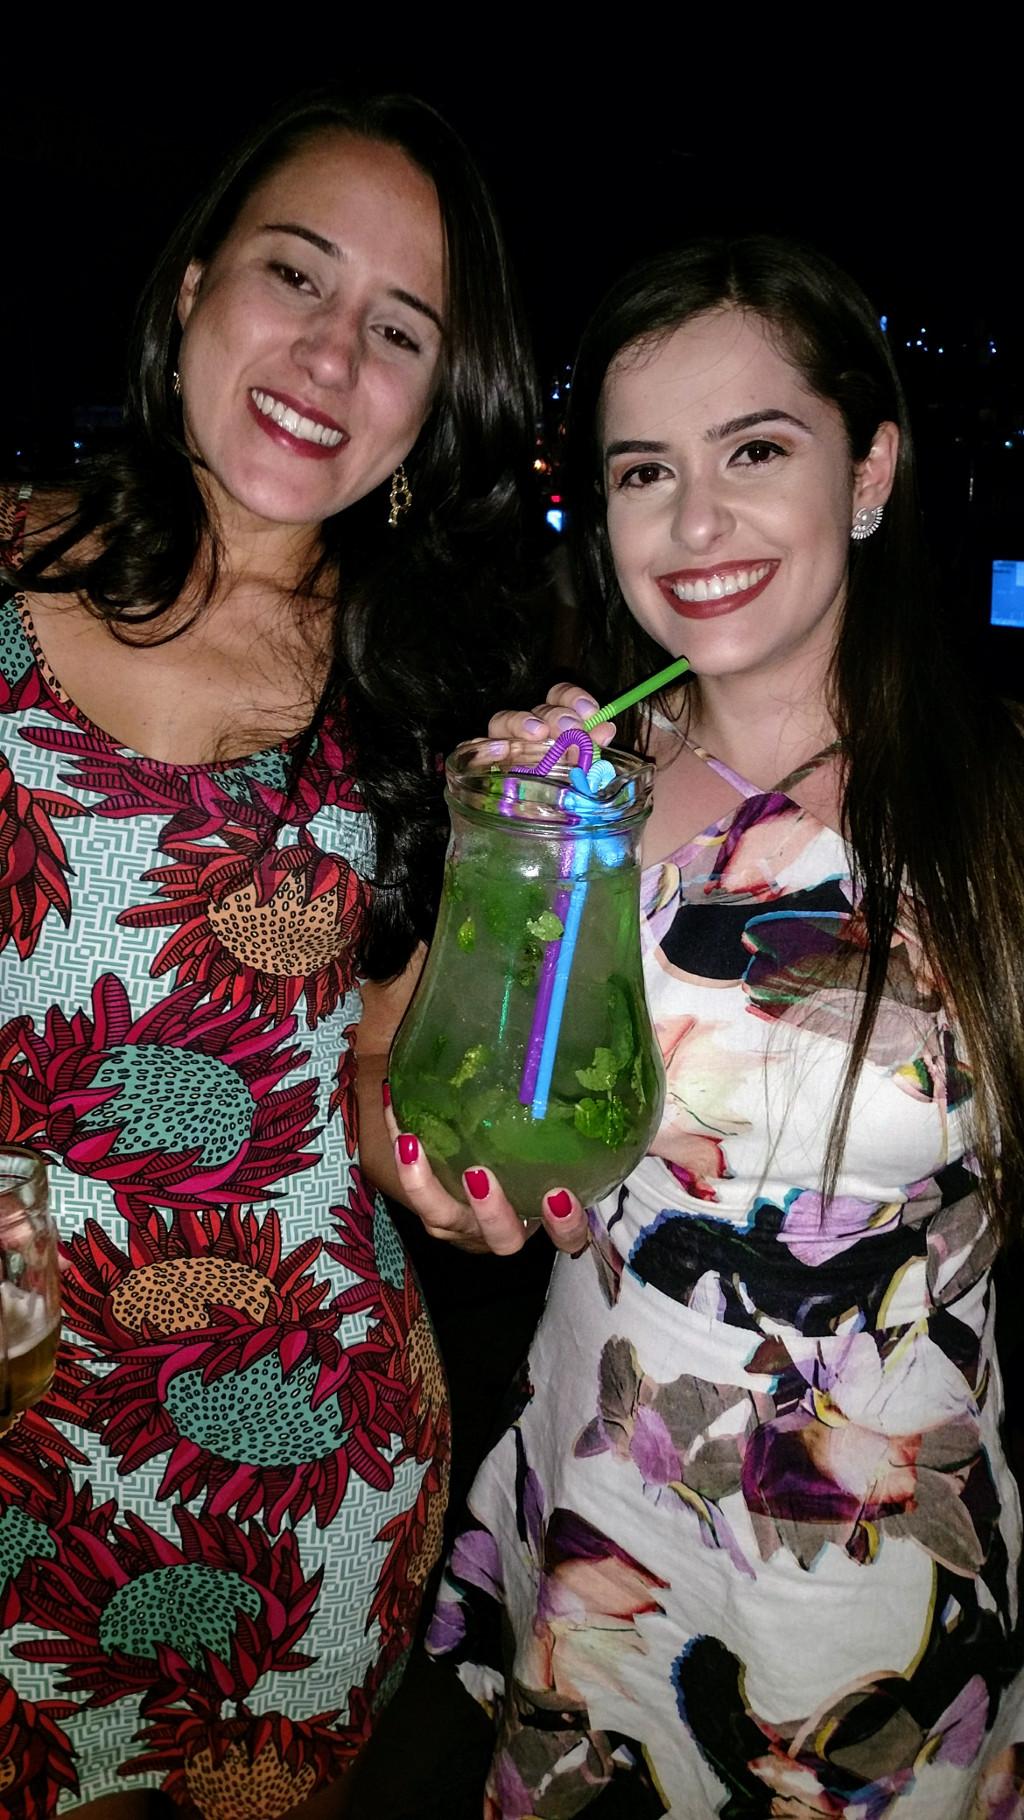 jangal_aniversario_drink